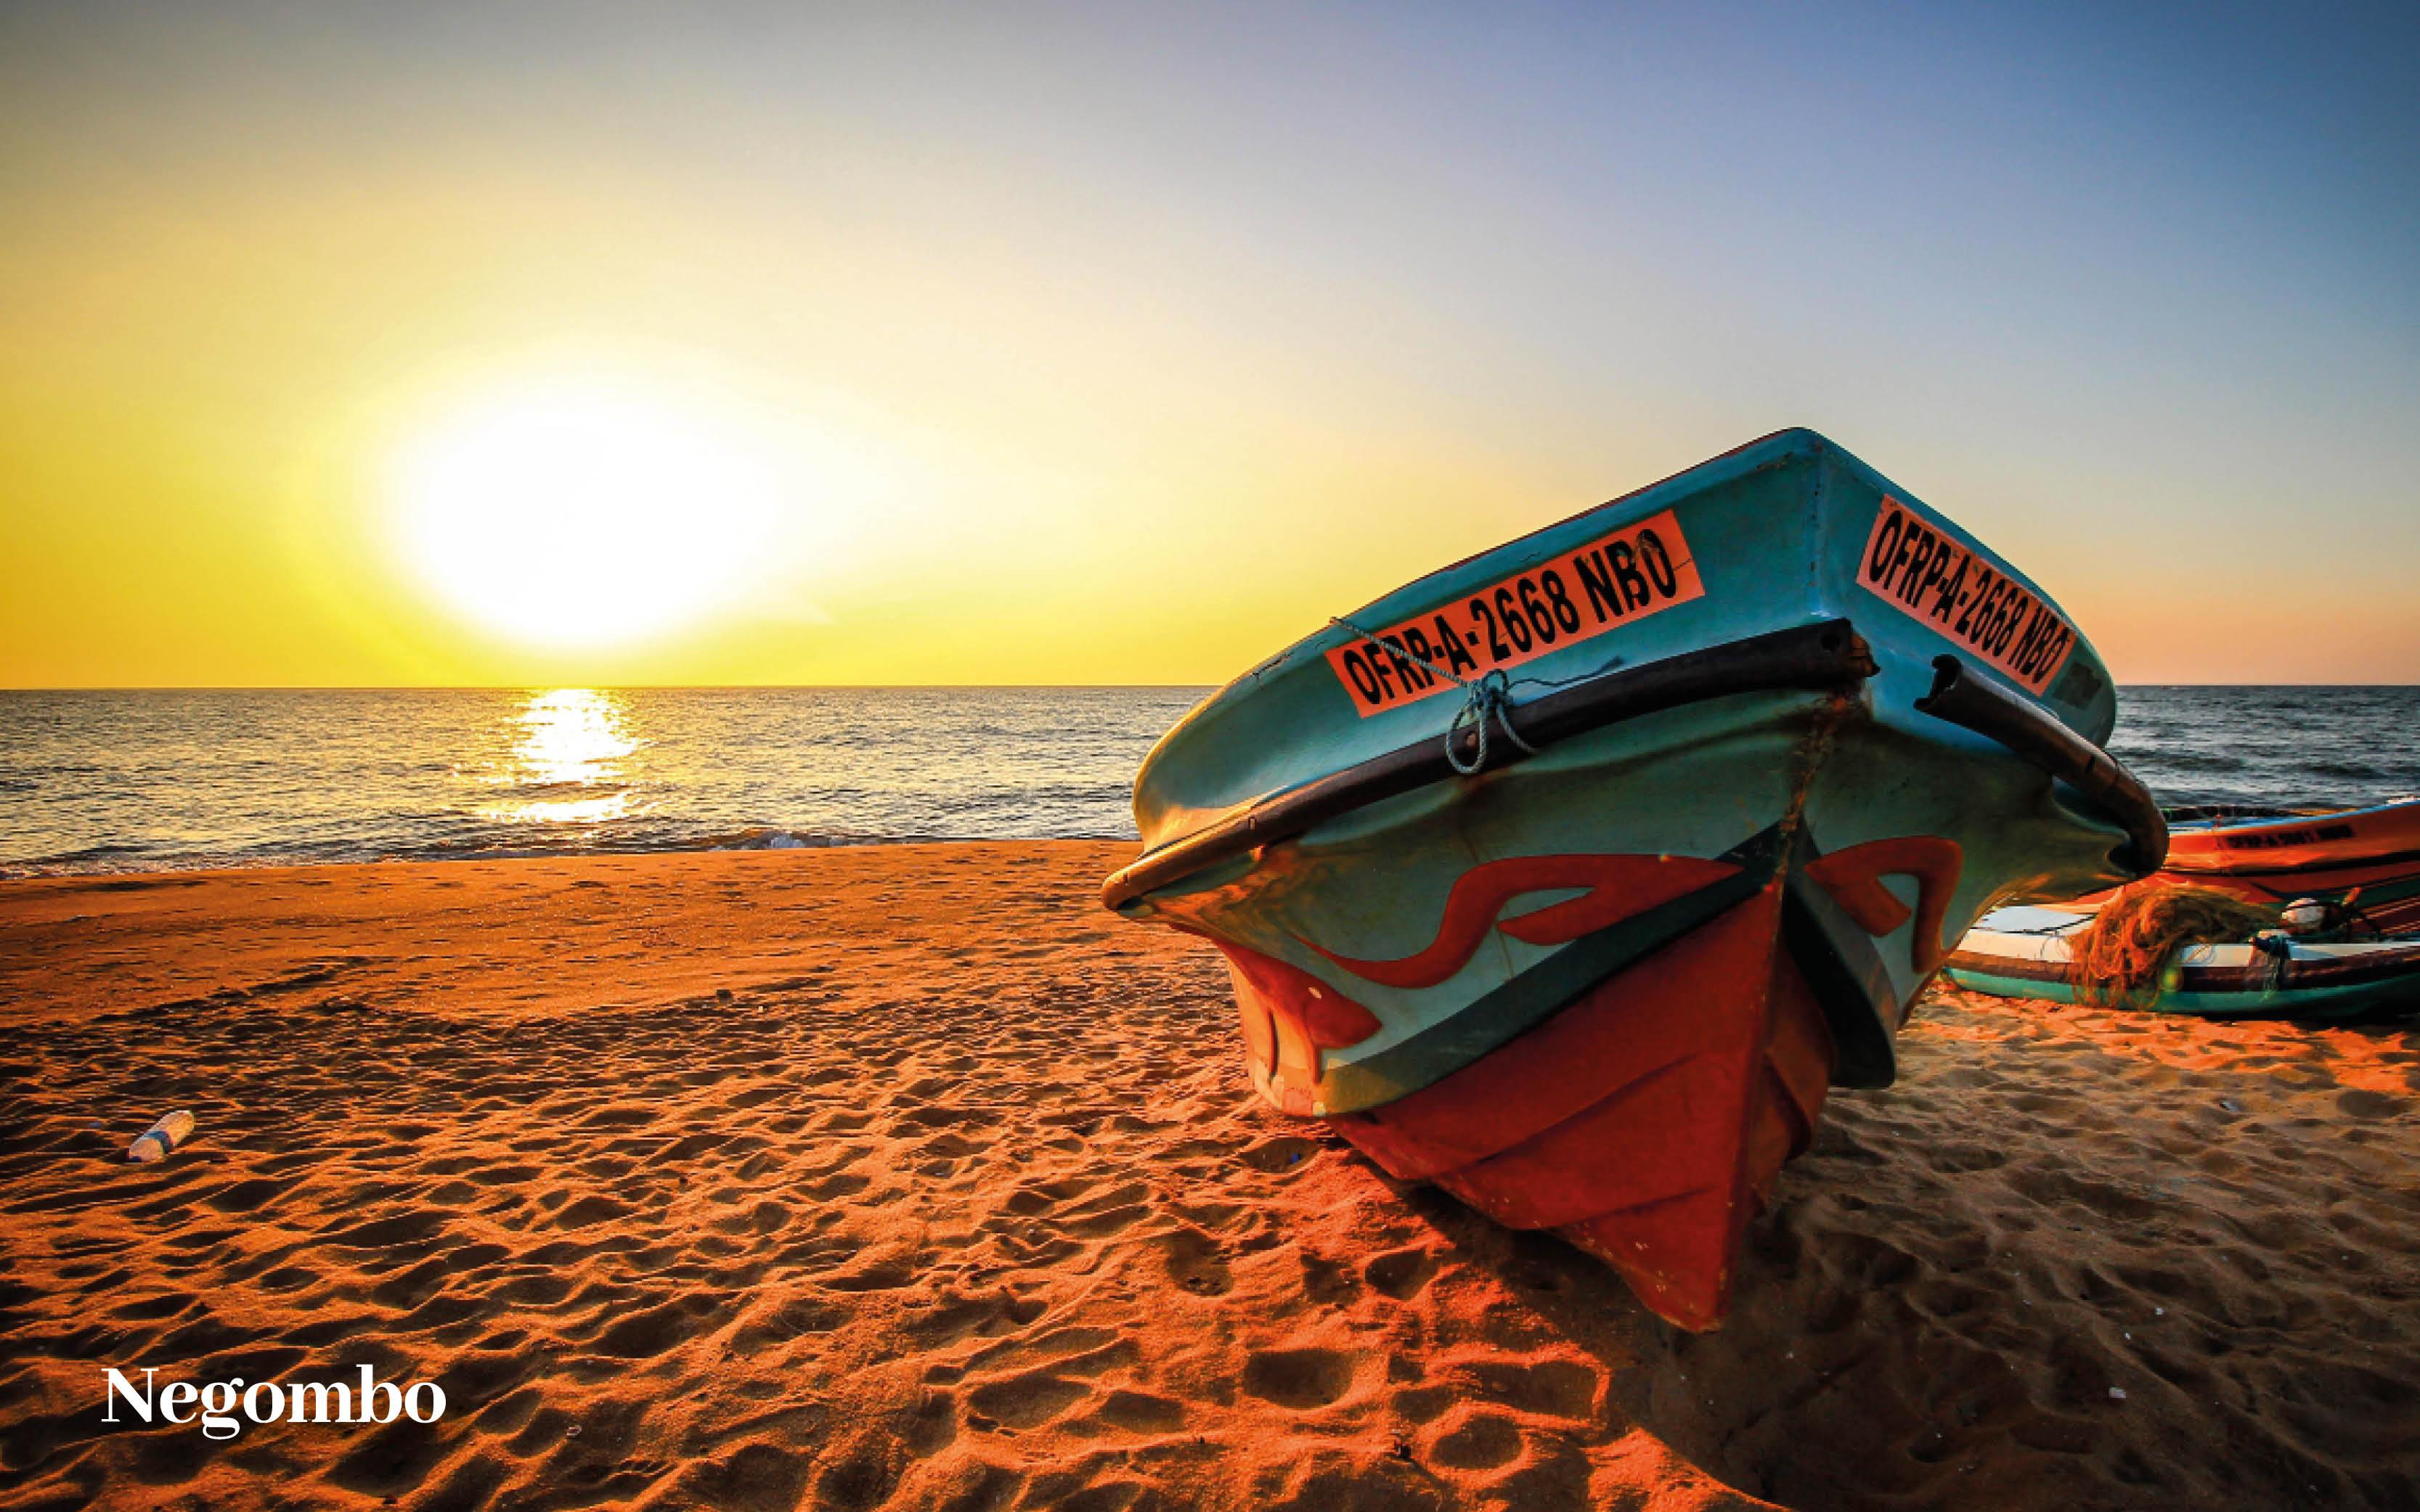 Classic Sri Lanka Holiday Offer blog images